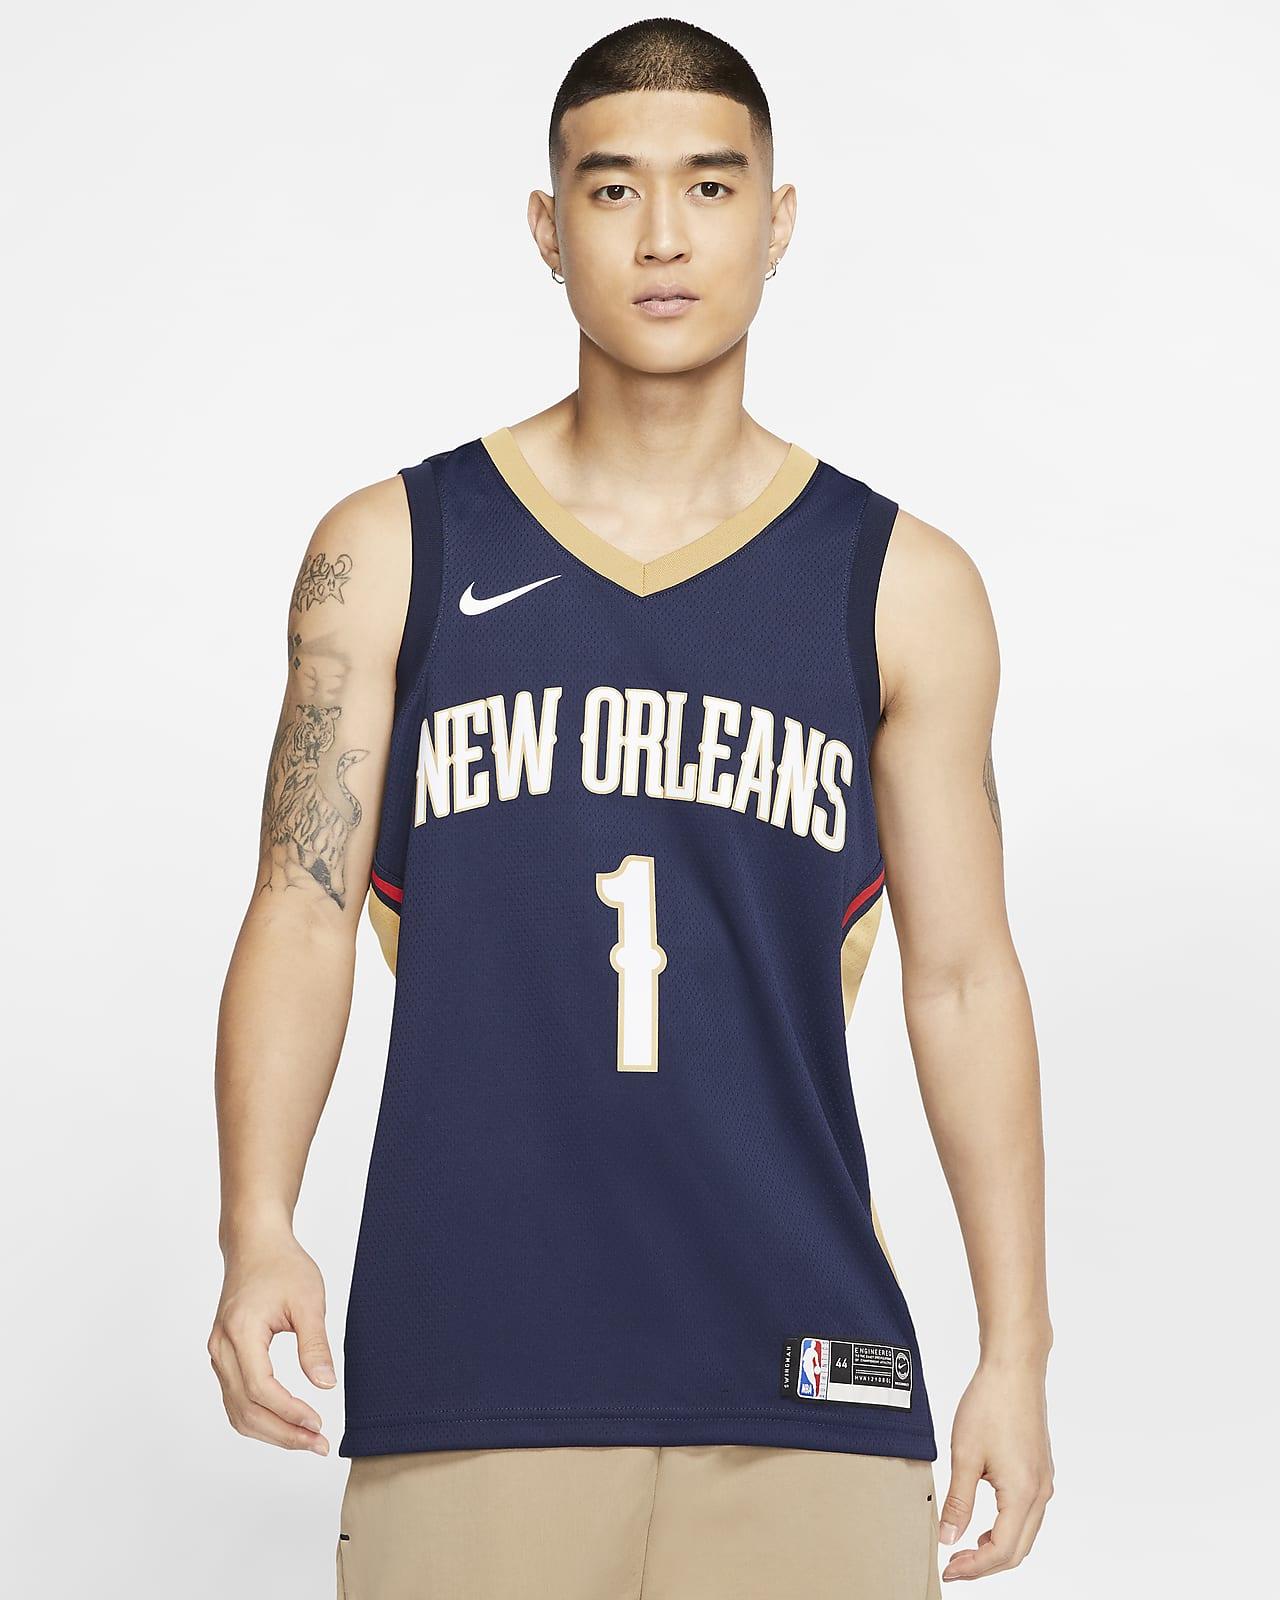 Camiseta Nike NBA Swingman para hombre Zion Williamson Pelicans Icon Edition